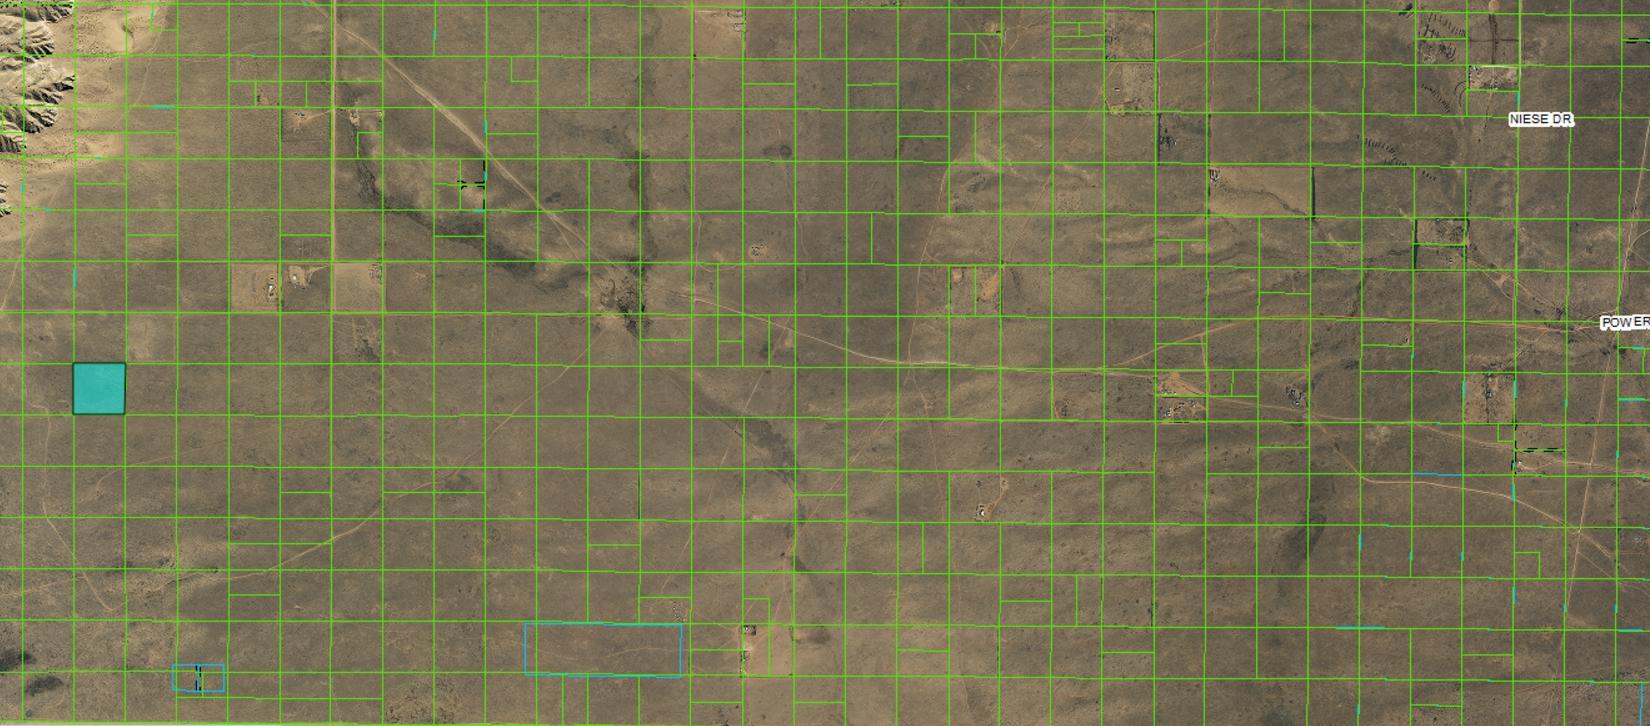 Off Pajarito (JMT #10) Road SW Property Photo - Albuquerque, NM real estate listing